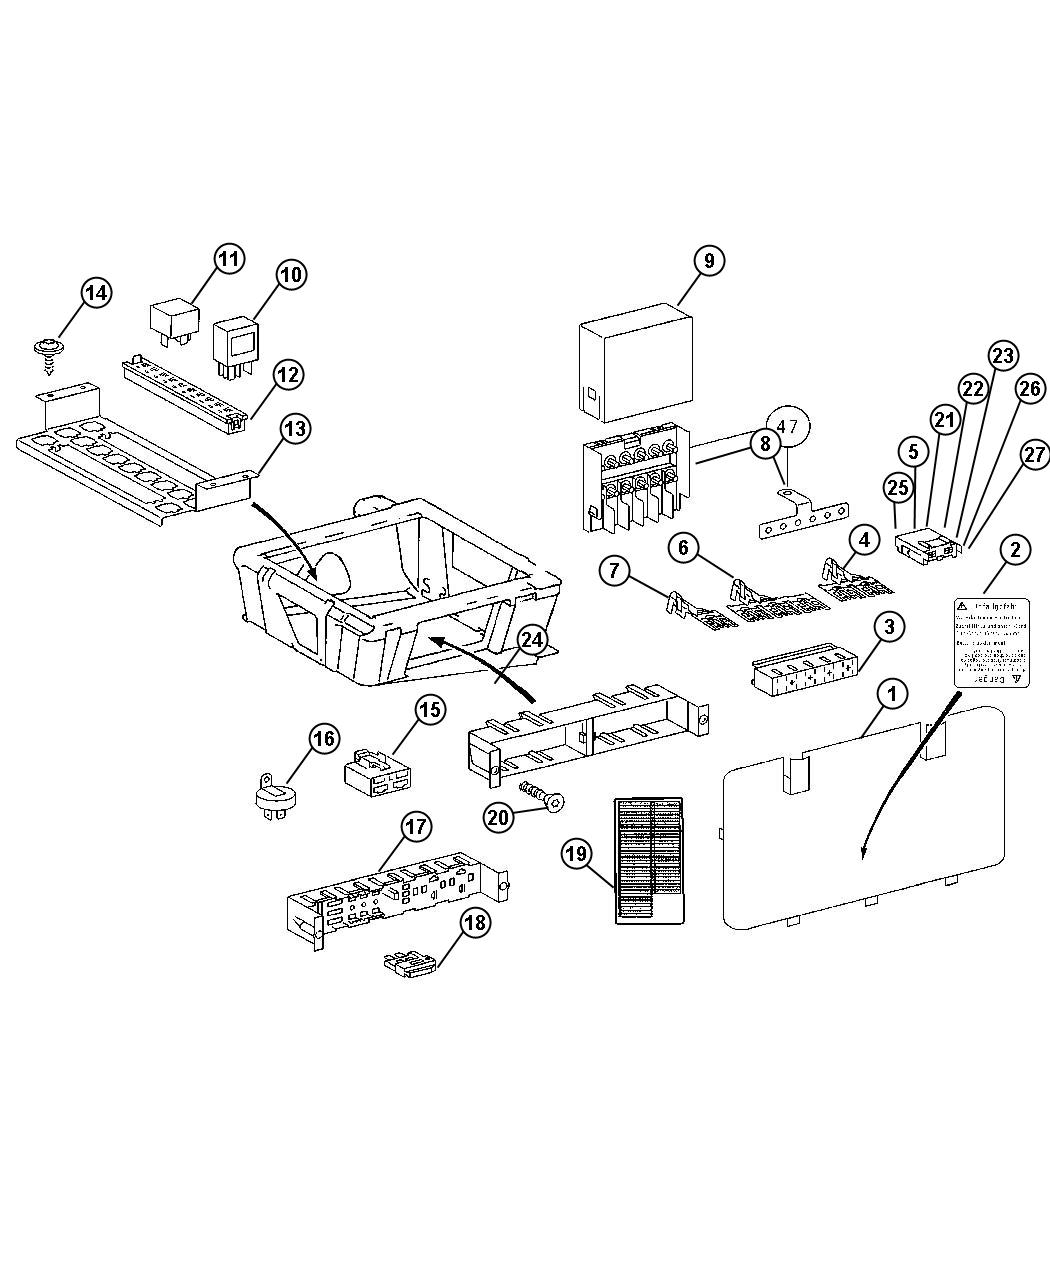 2012 mercedes e350 wiring diagram